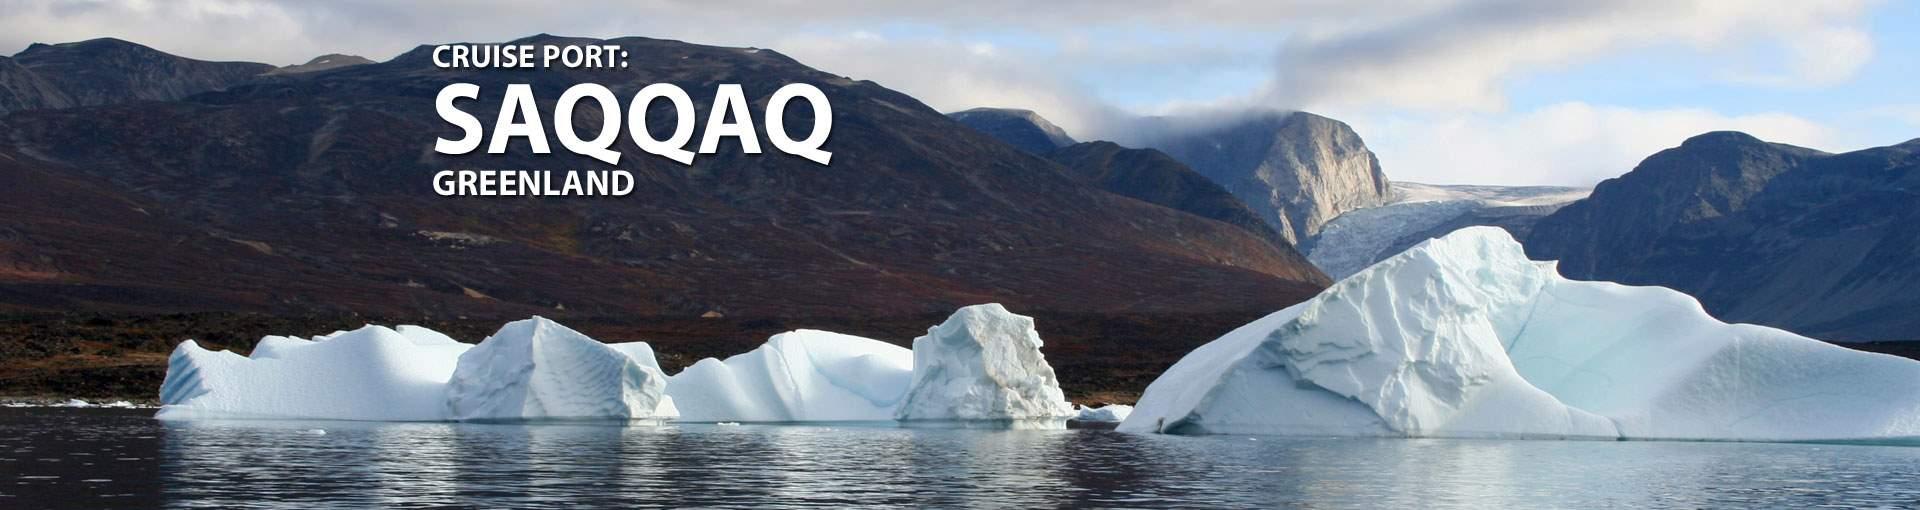 Cruises to Saqqaq, Greenland